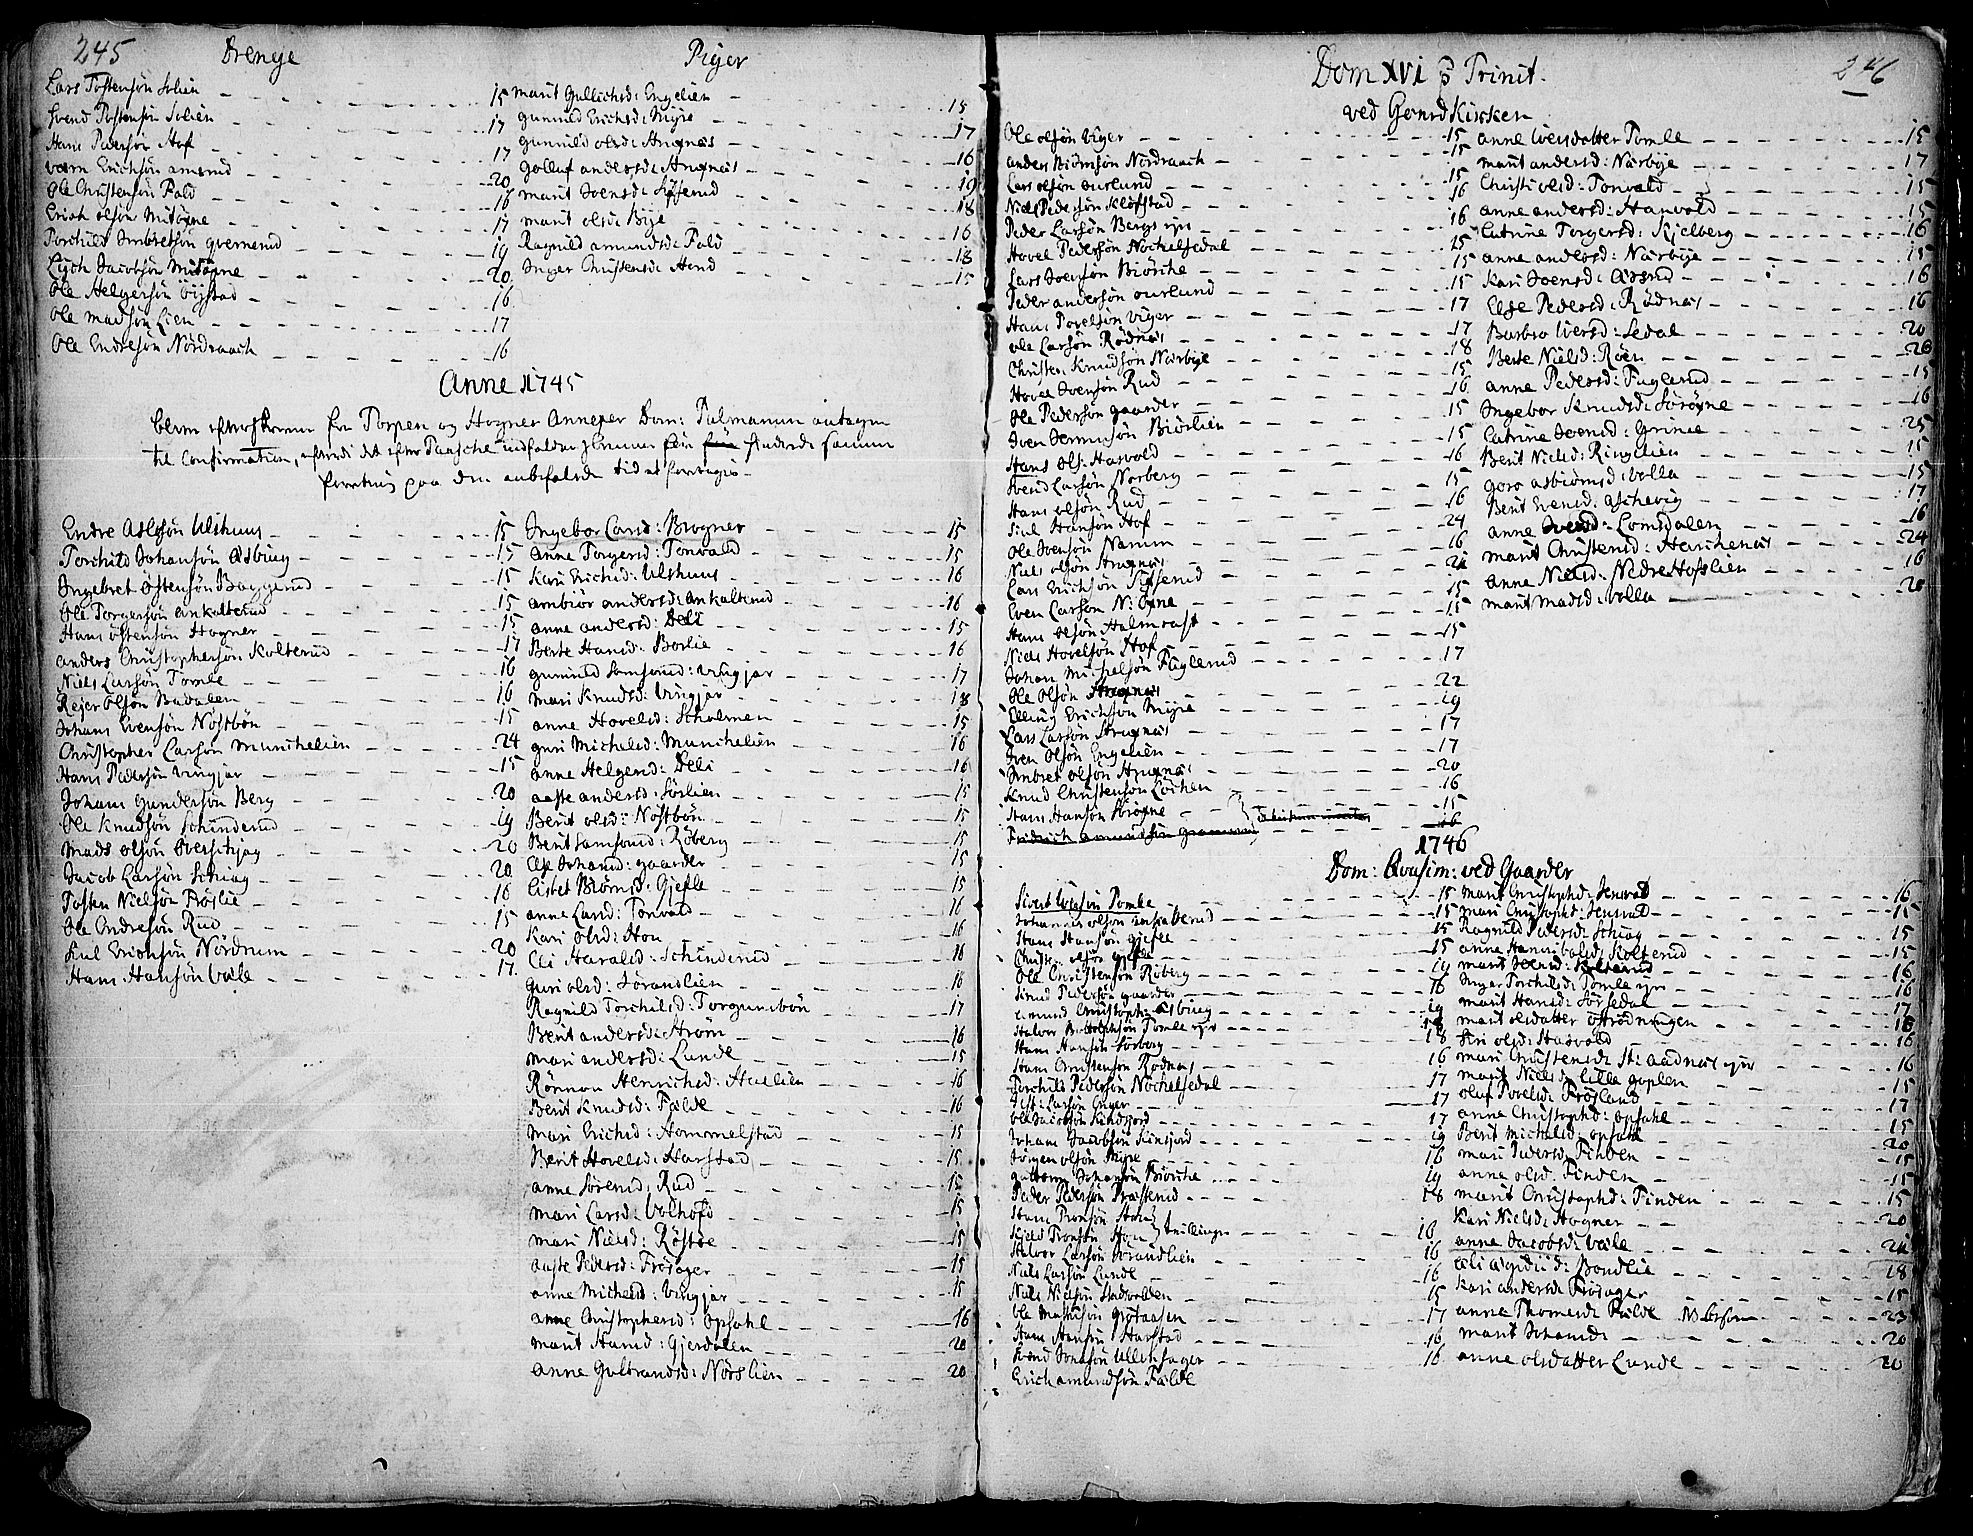 SAH, Land prestekontor, Ministerialbok nr. 2, 1733-1764, s. 245-246